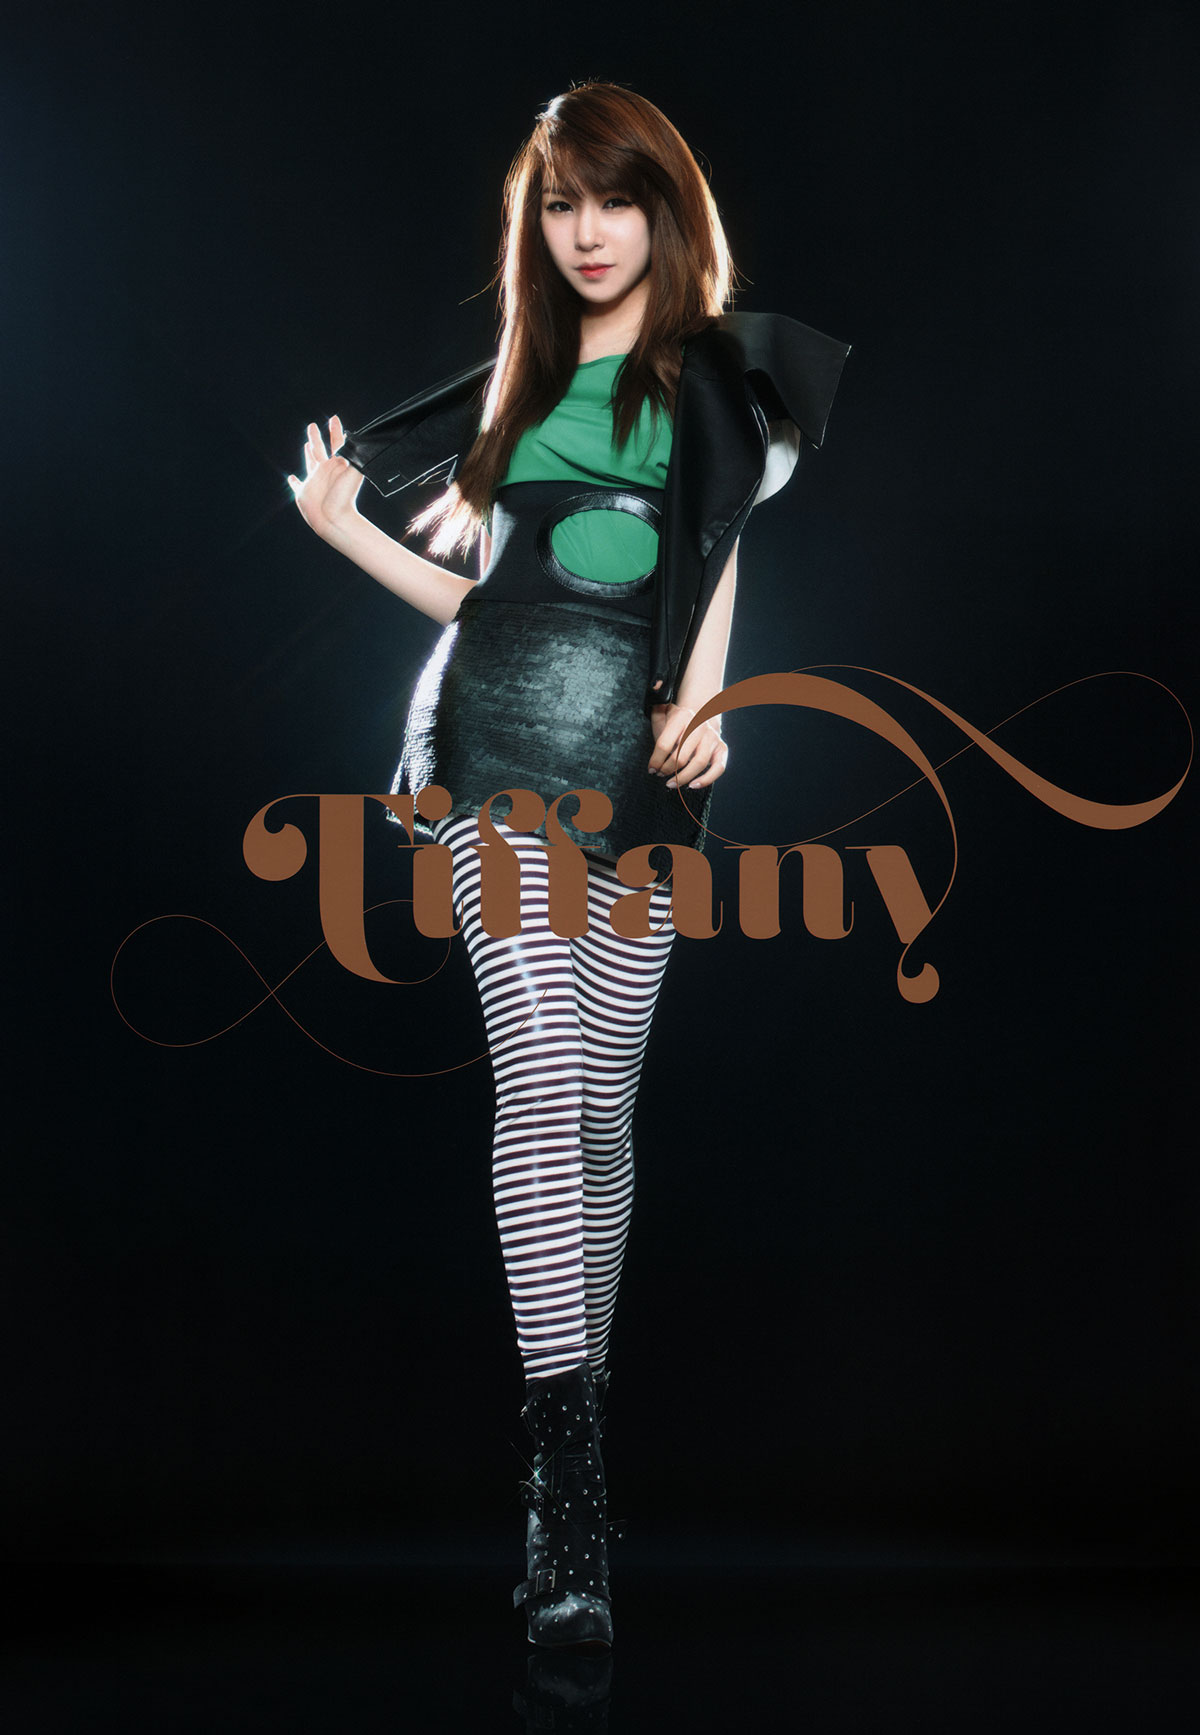 Tiffany Girls Generation 2011 Tour brochure